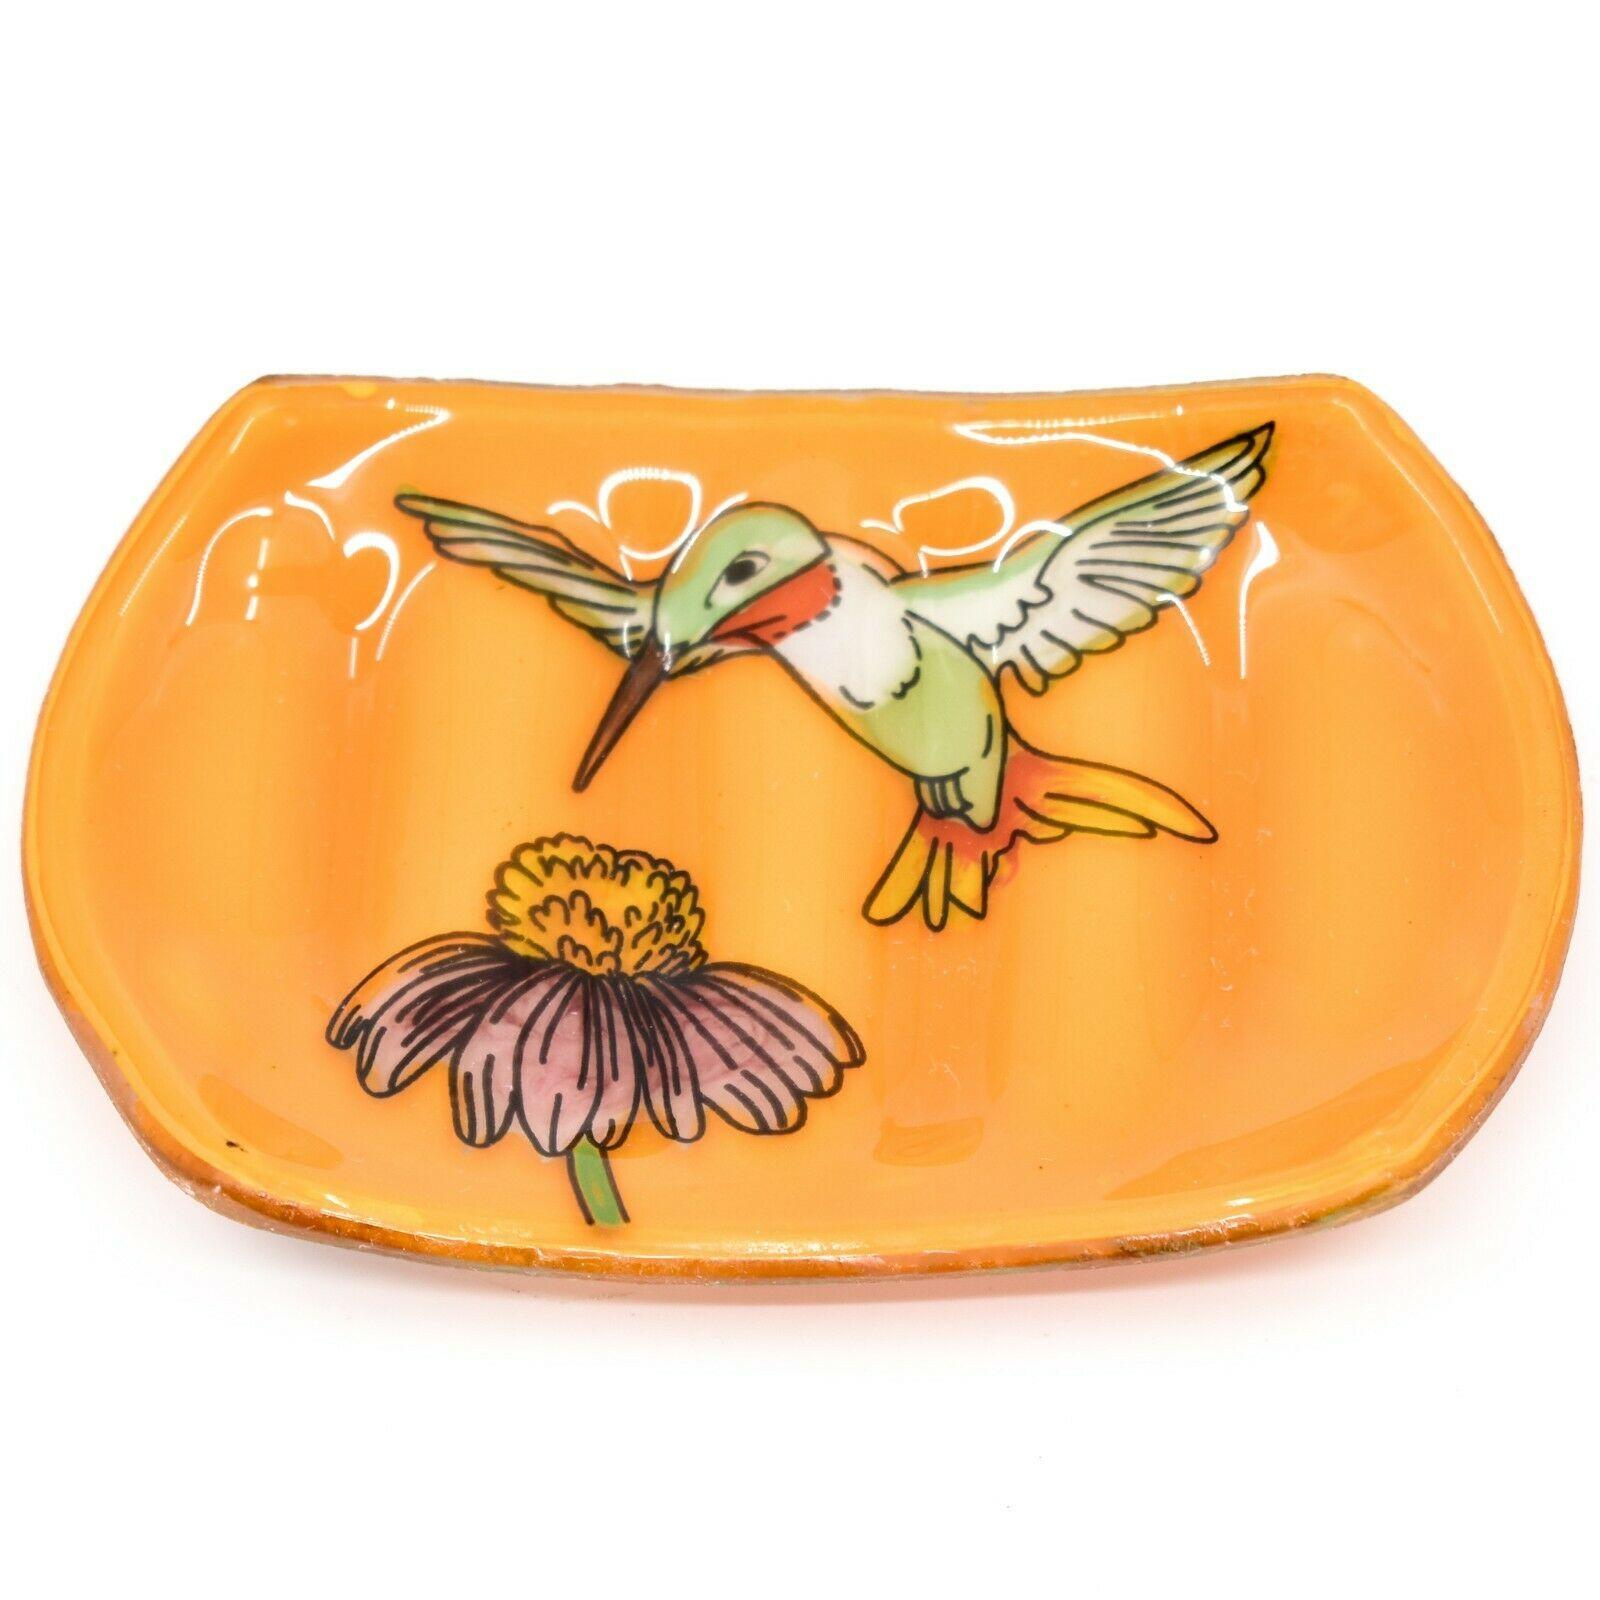 Fused Art Glass Hummingbird Bird Design Orange Soap Dish Handmade Ecuador